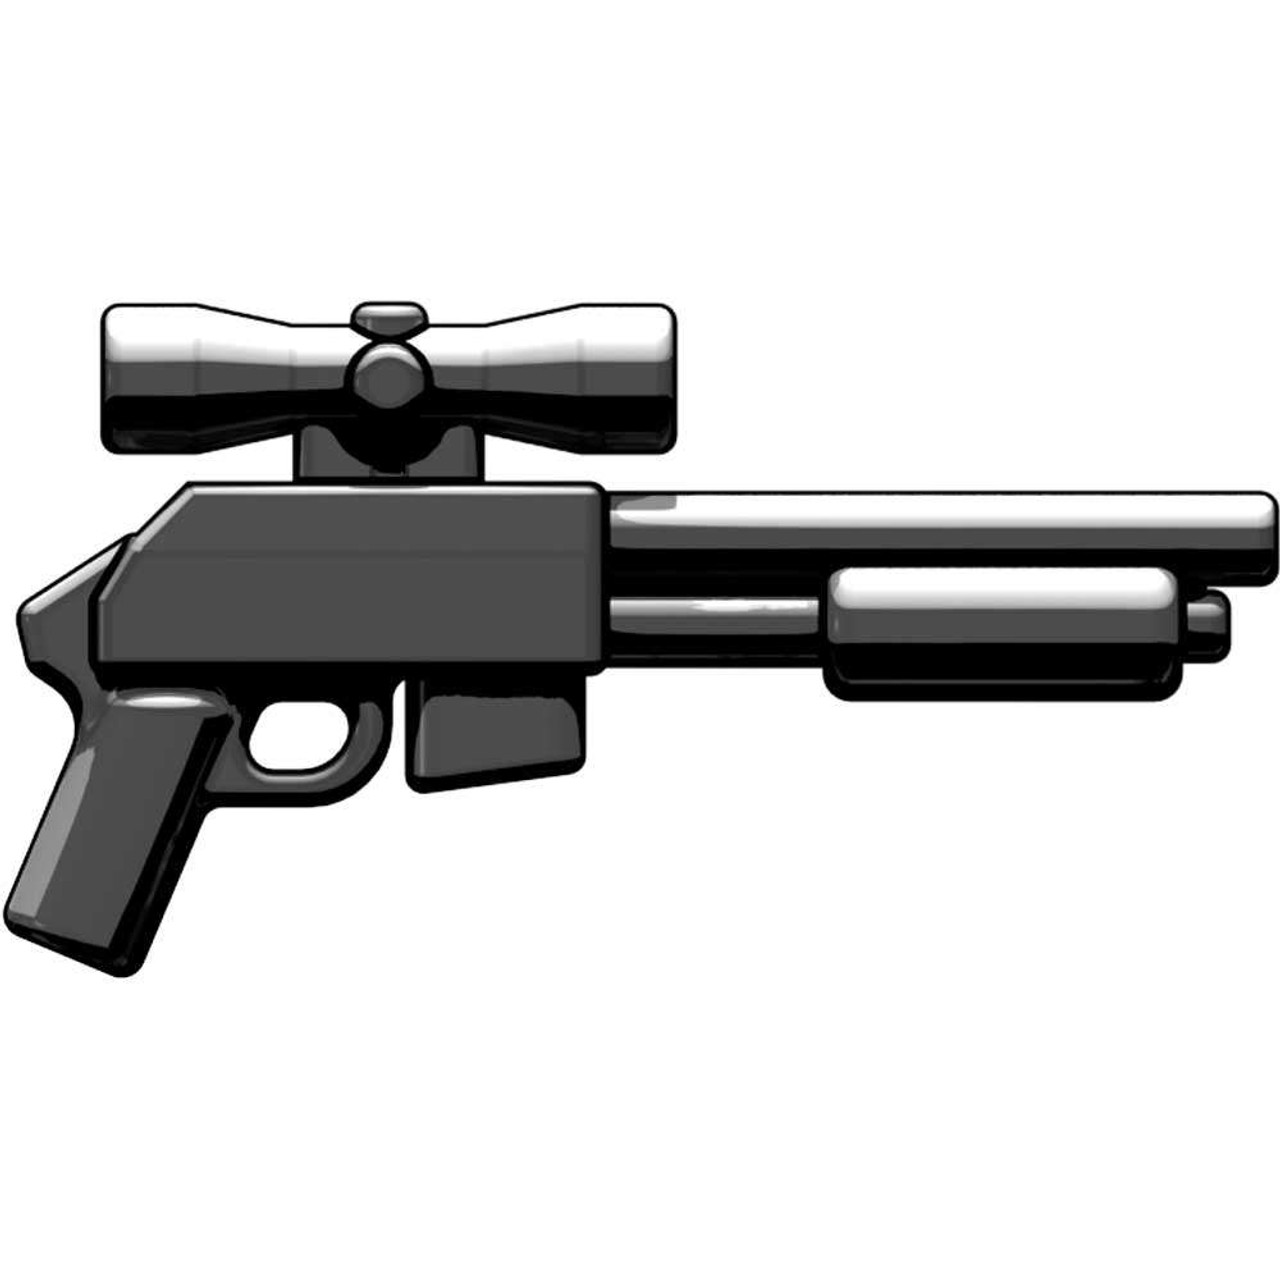 BrickArms Weapons M47 Tactical Shotgun 2.5-Inch [Black]